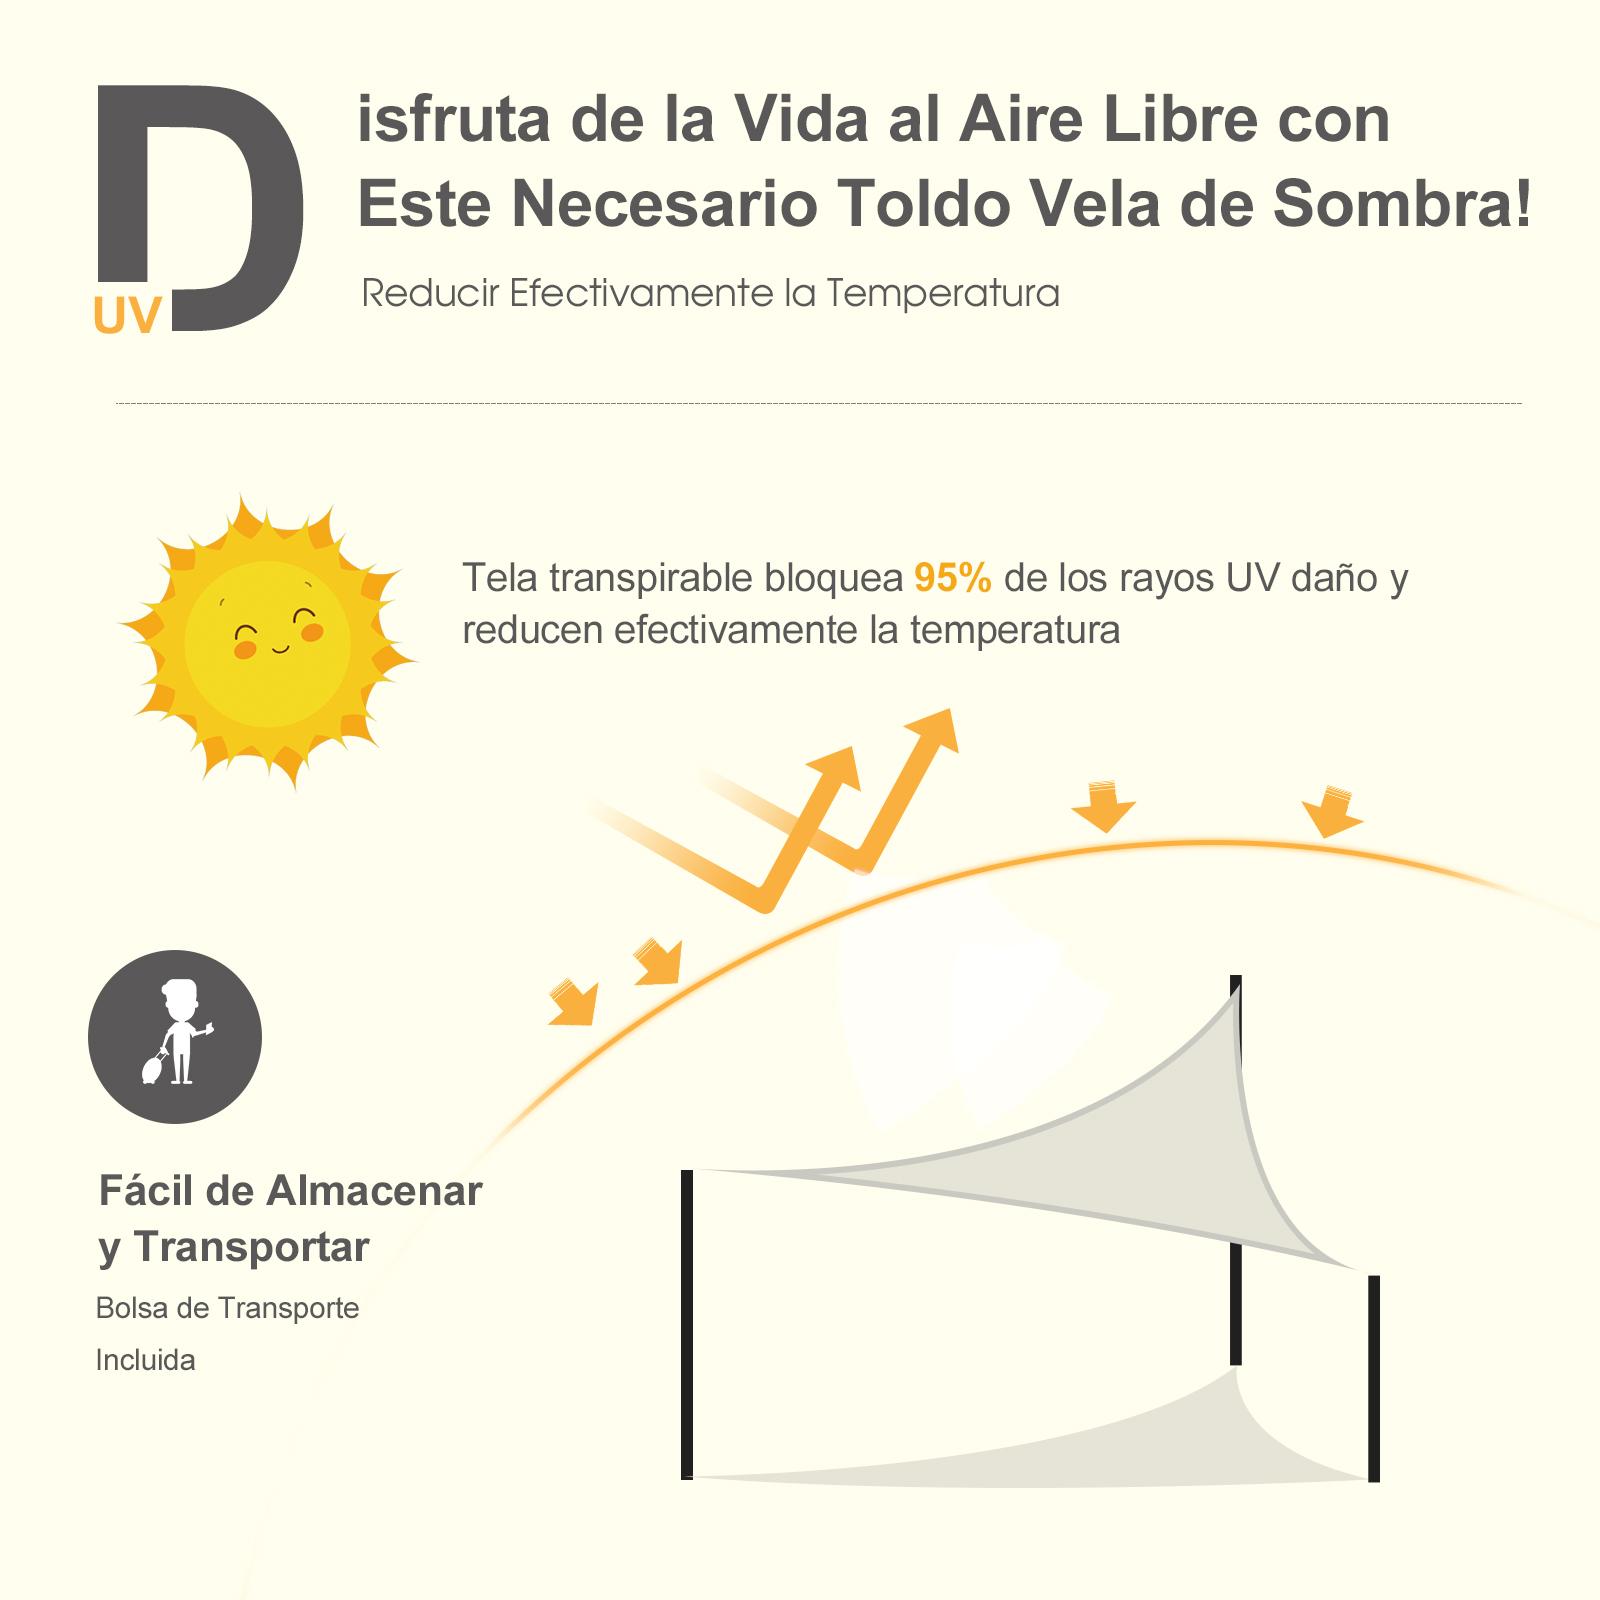 Toldo-Vela-Sombrilla-Parasol-Triangulo-Tejido-de-Poliester-160g-m2-Jardin-Playa miniatura 11